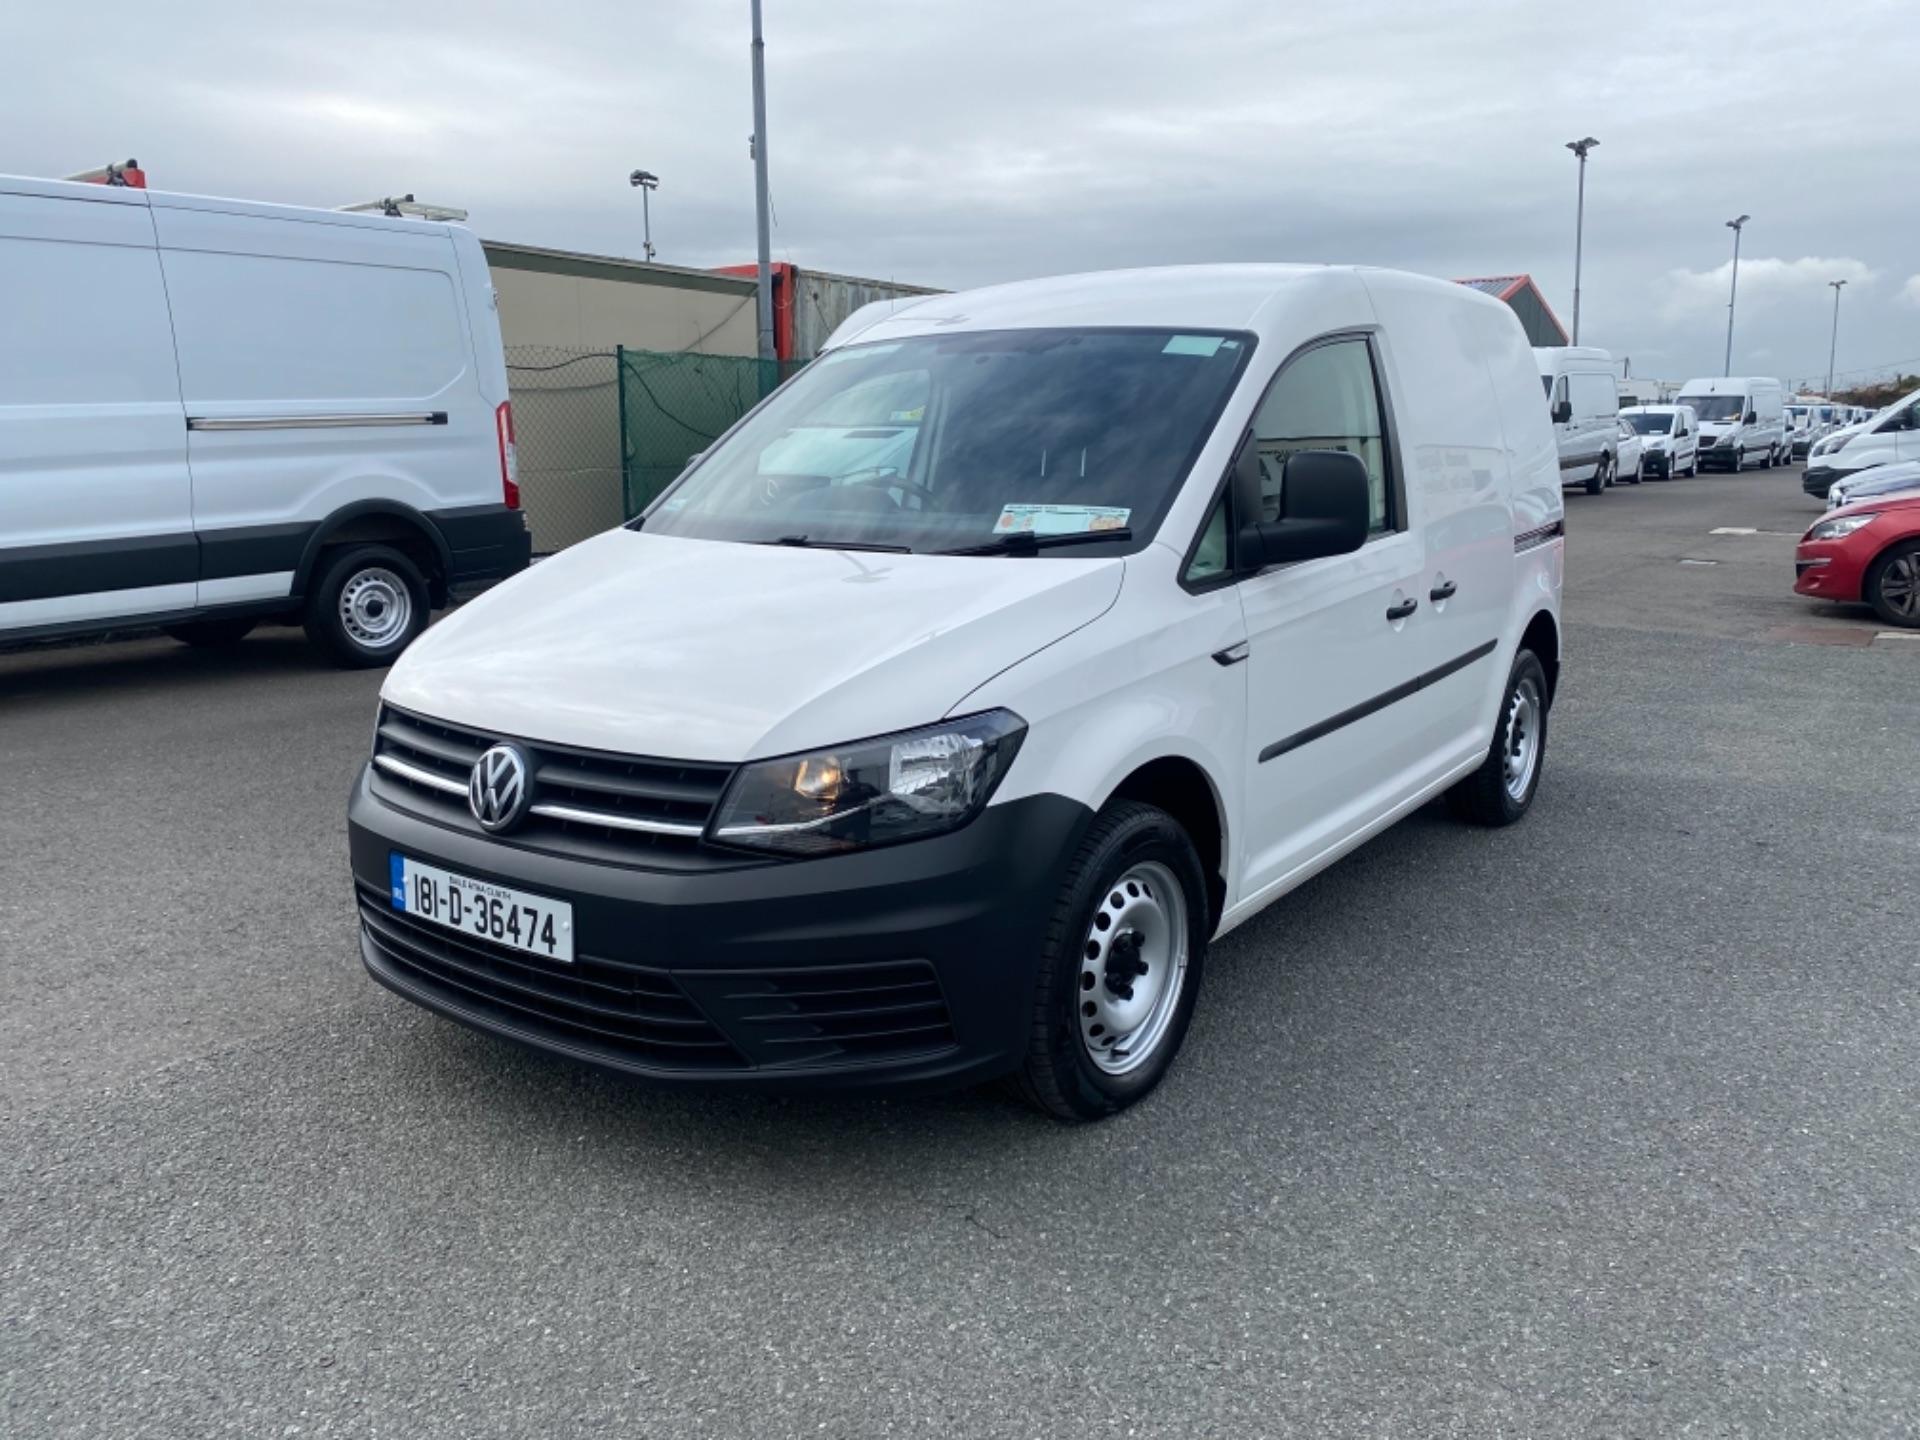 2018 Volkswagen Caddy PV TDI 102HP M5F (181D36474) Image 3